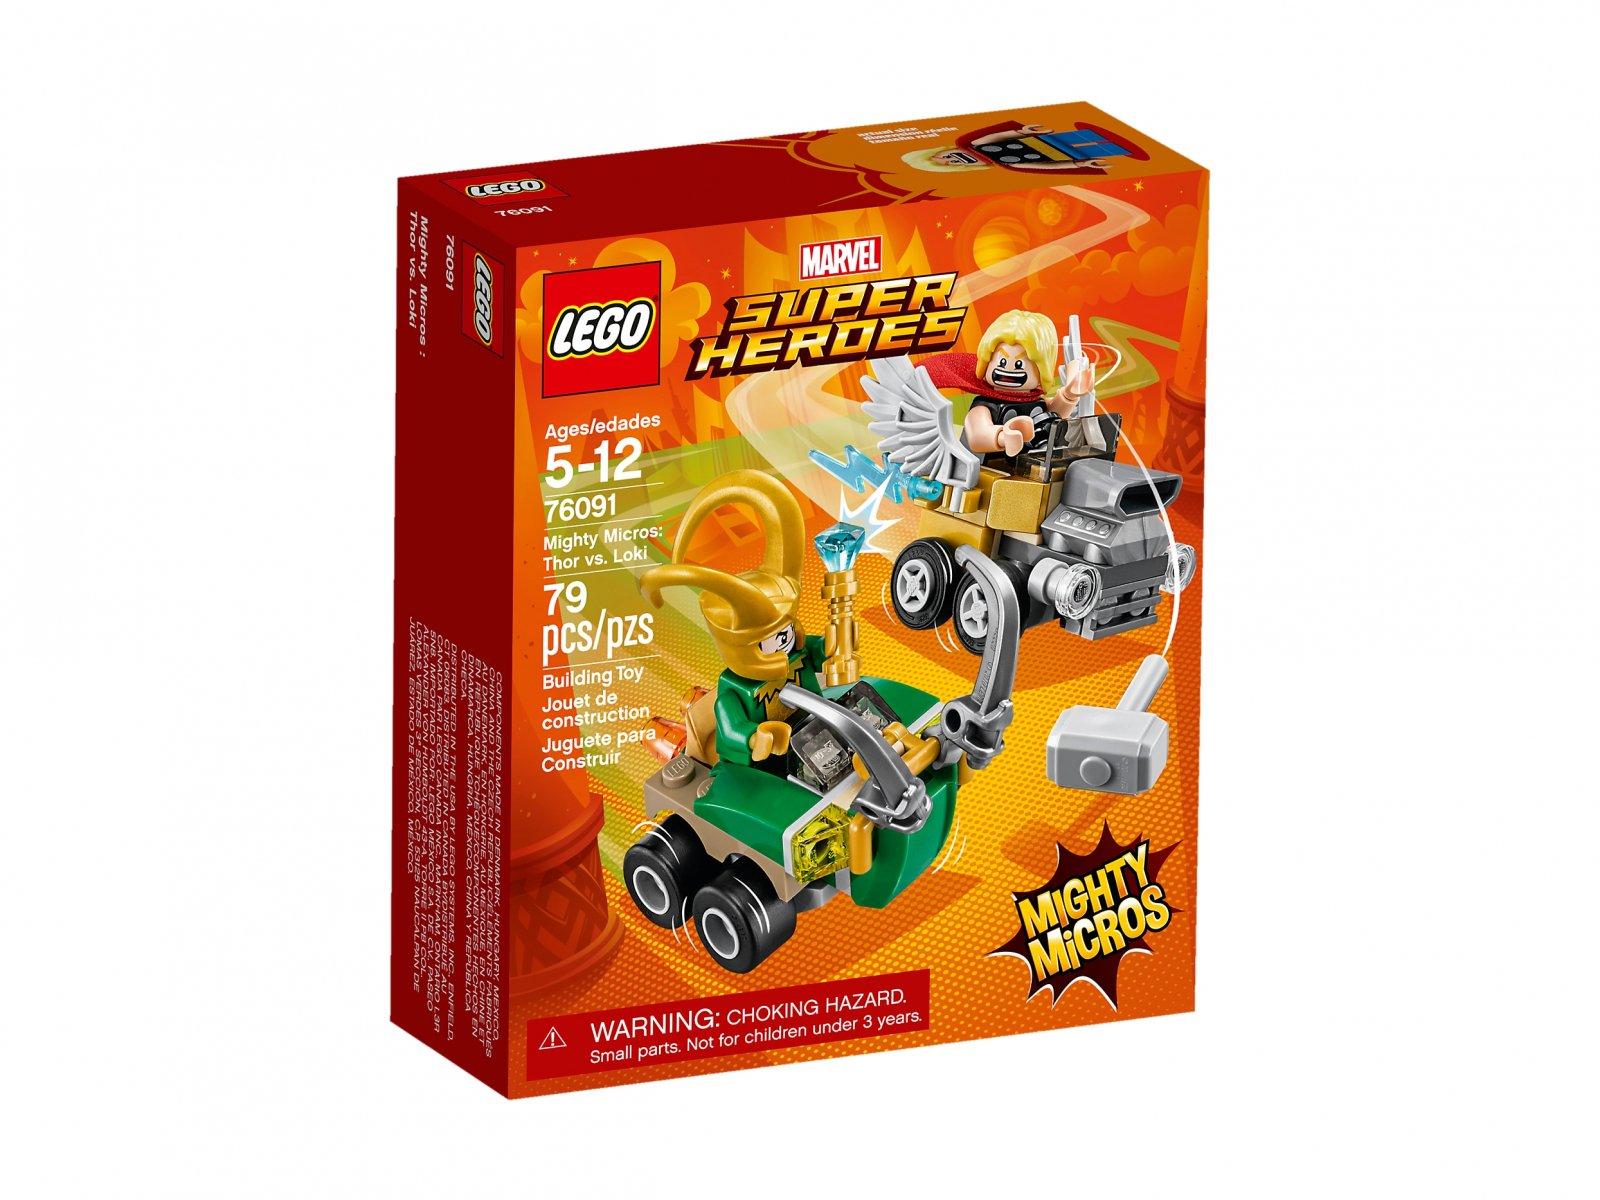 LEGO Marvel Super Heroes Thor vs. Loki 76091